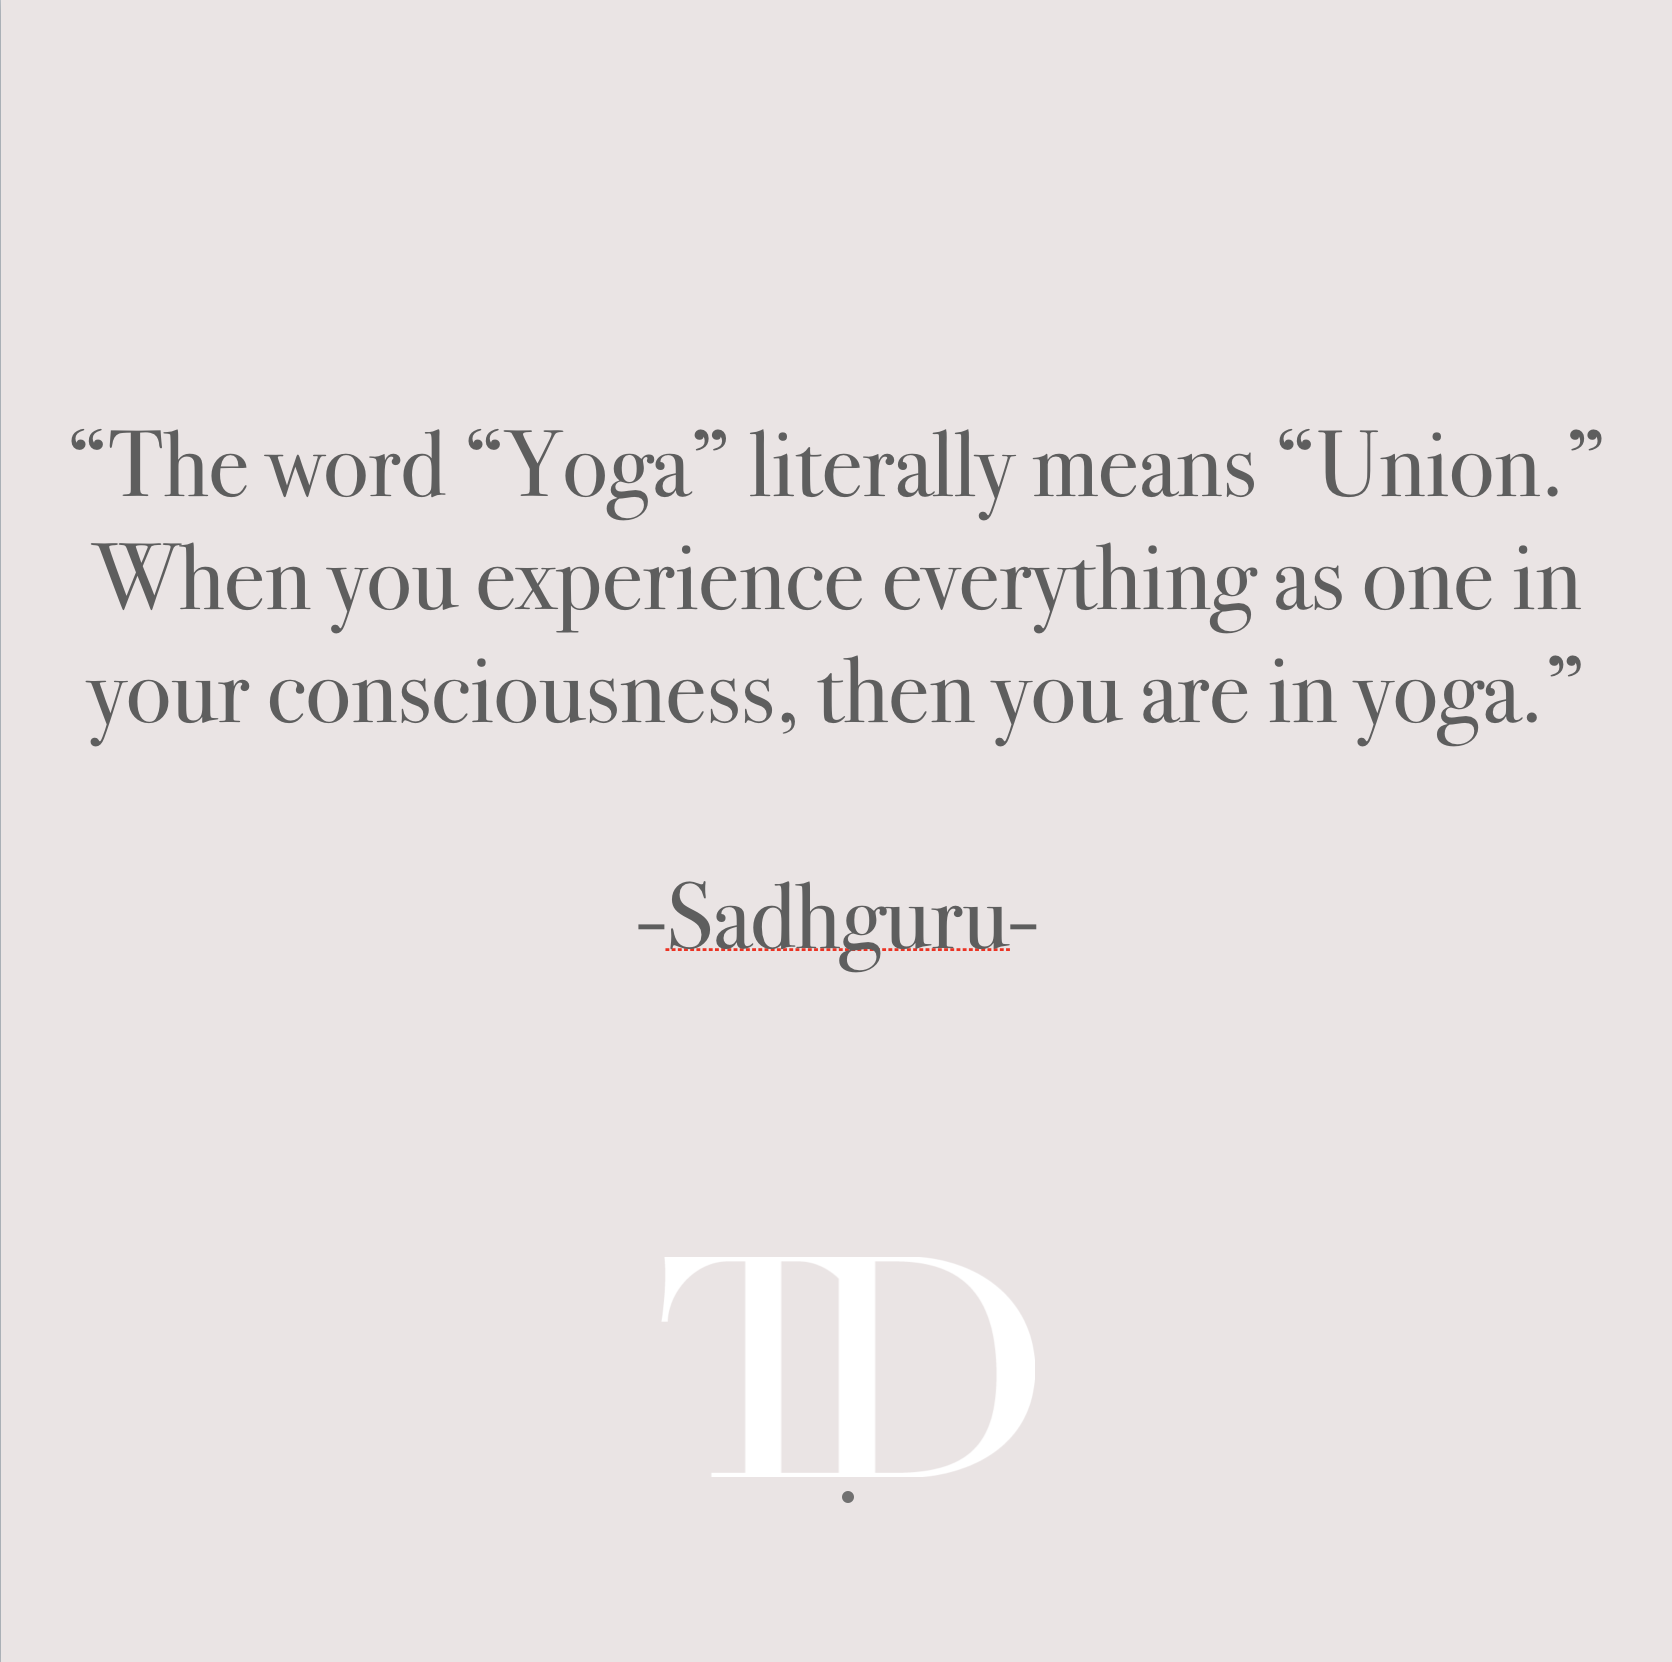 Sadhguru: Yoga means Union